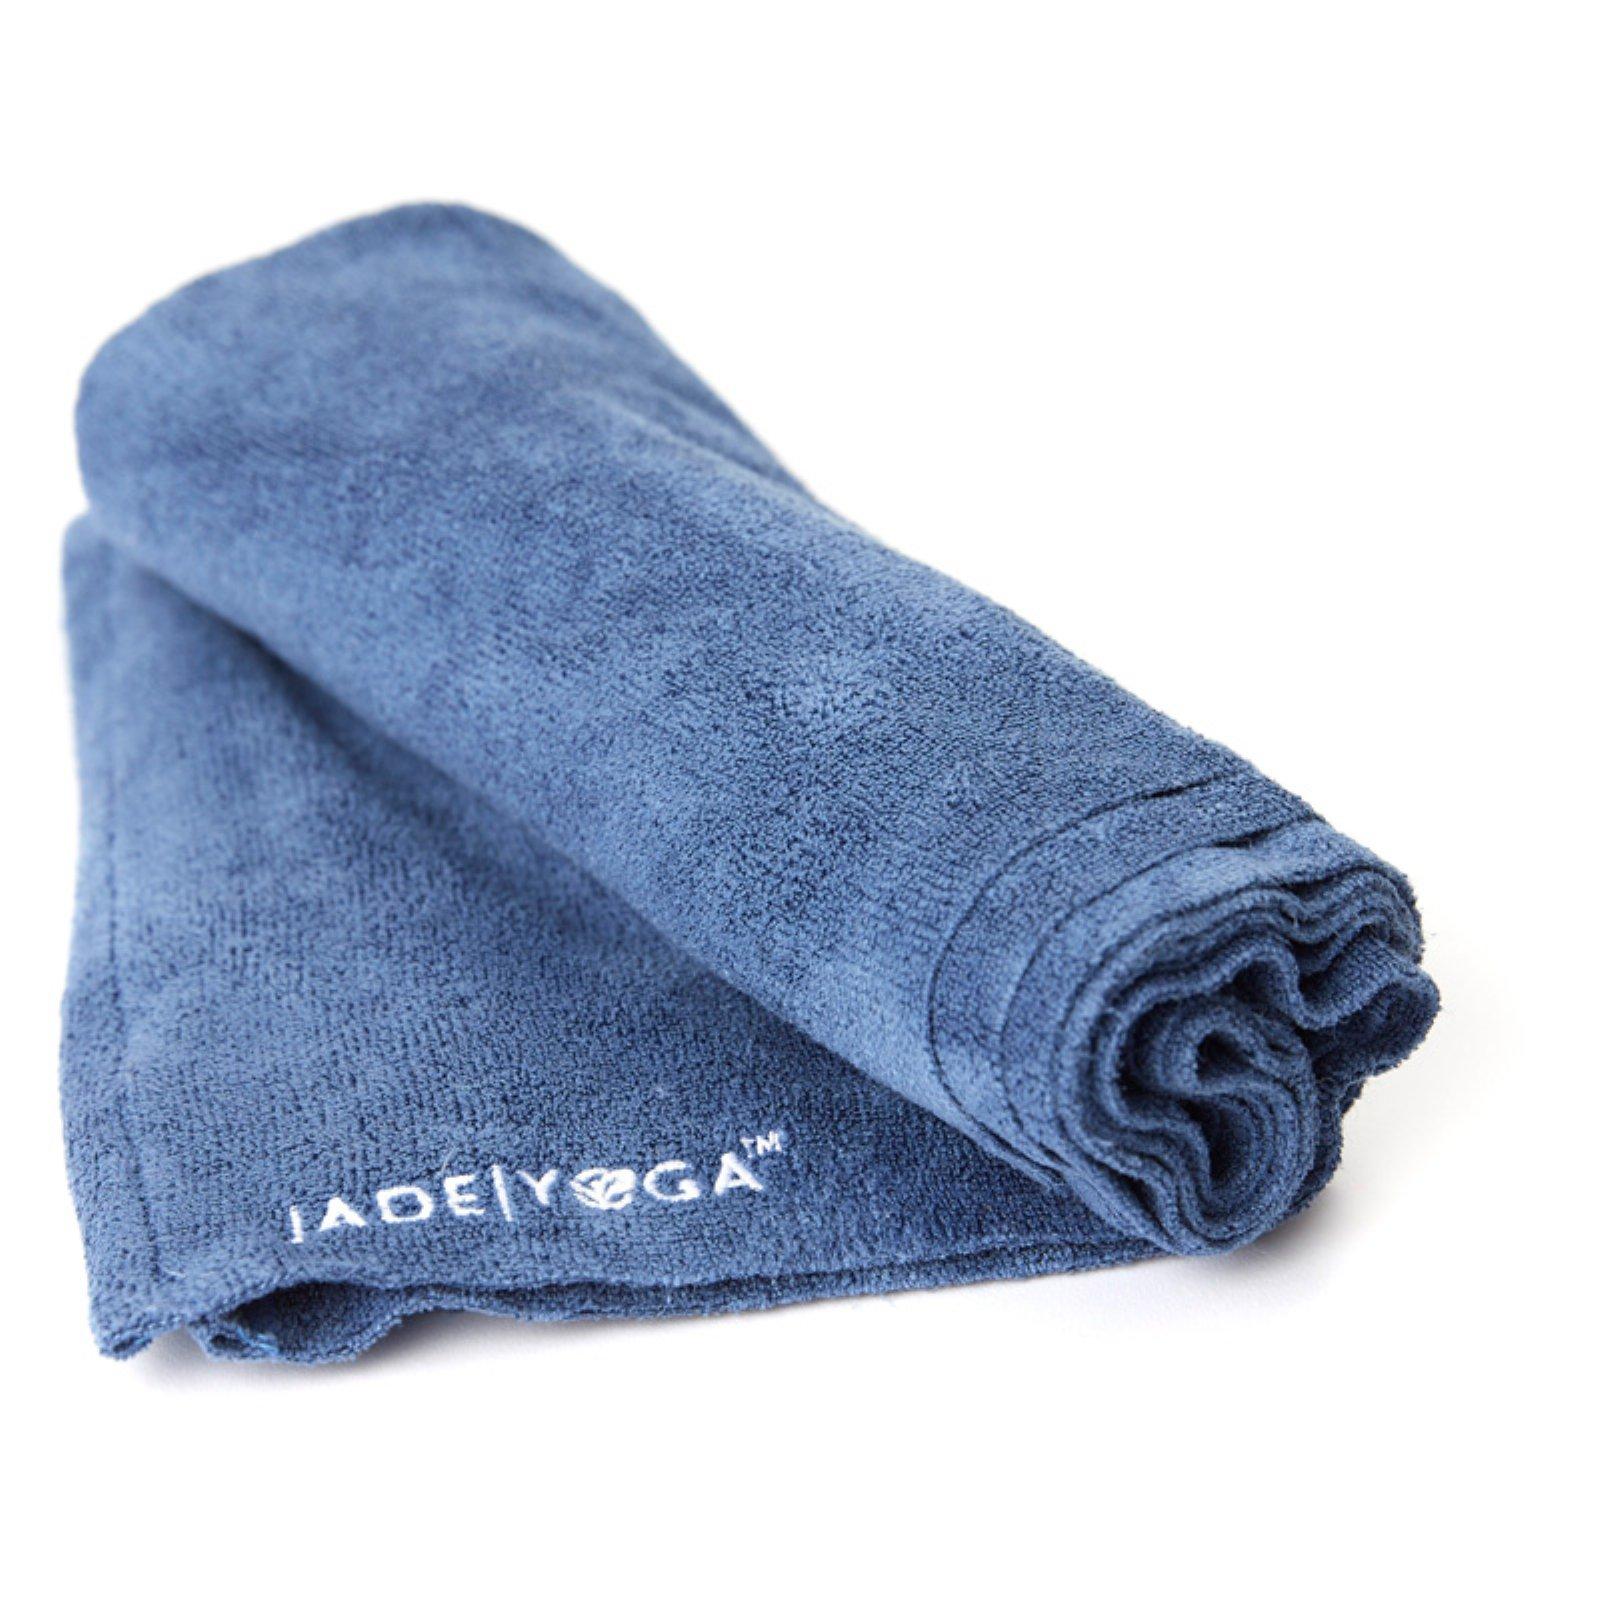 d87d6d0b683 Jade Microfiber Hand Towel Slate Blue Jade Yoga